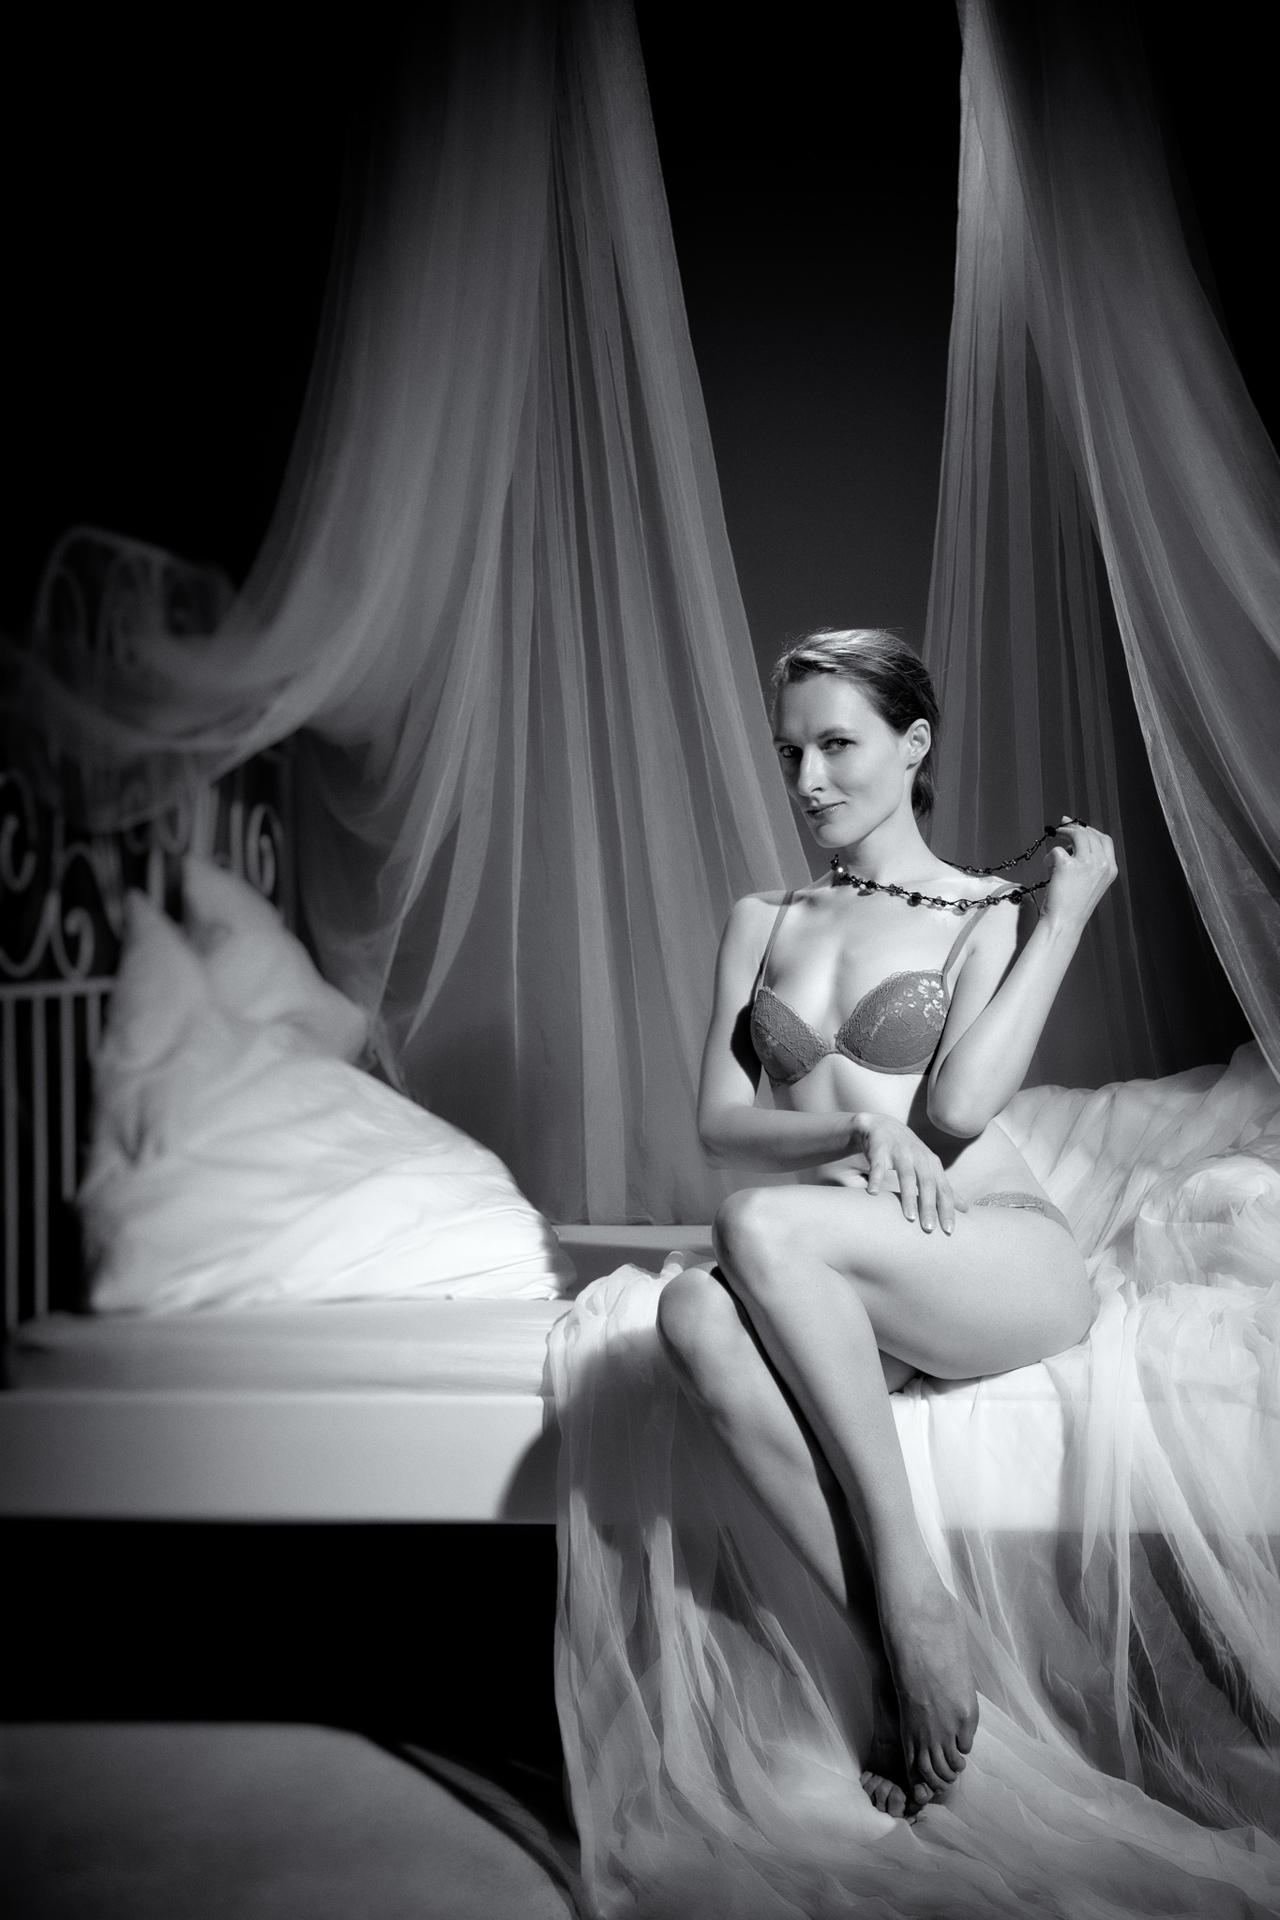 Fotografia aktu sensualna